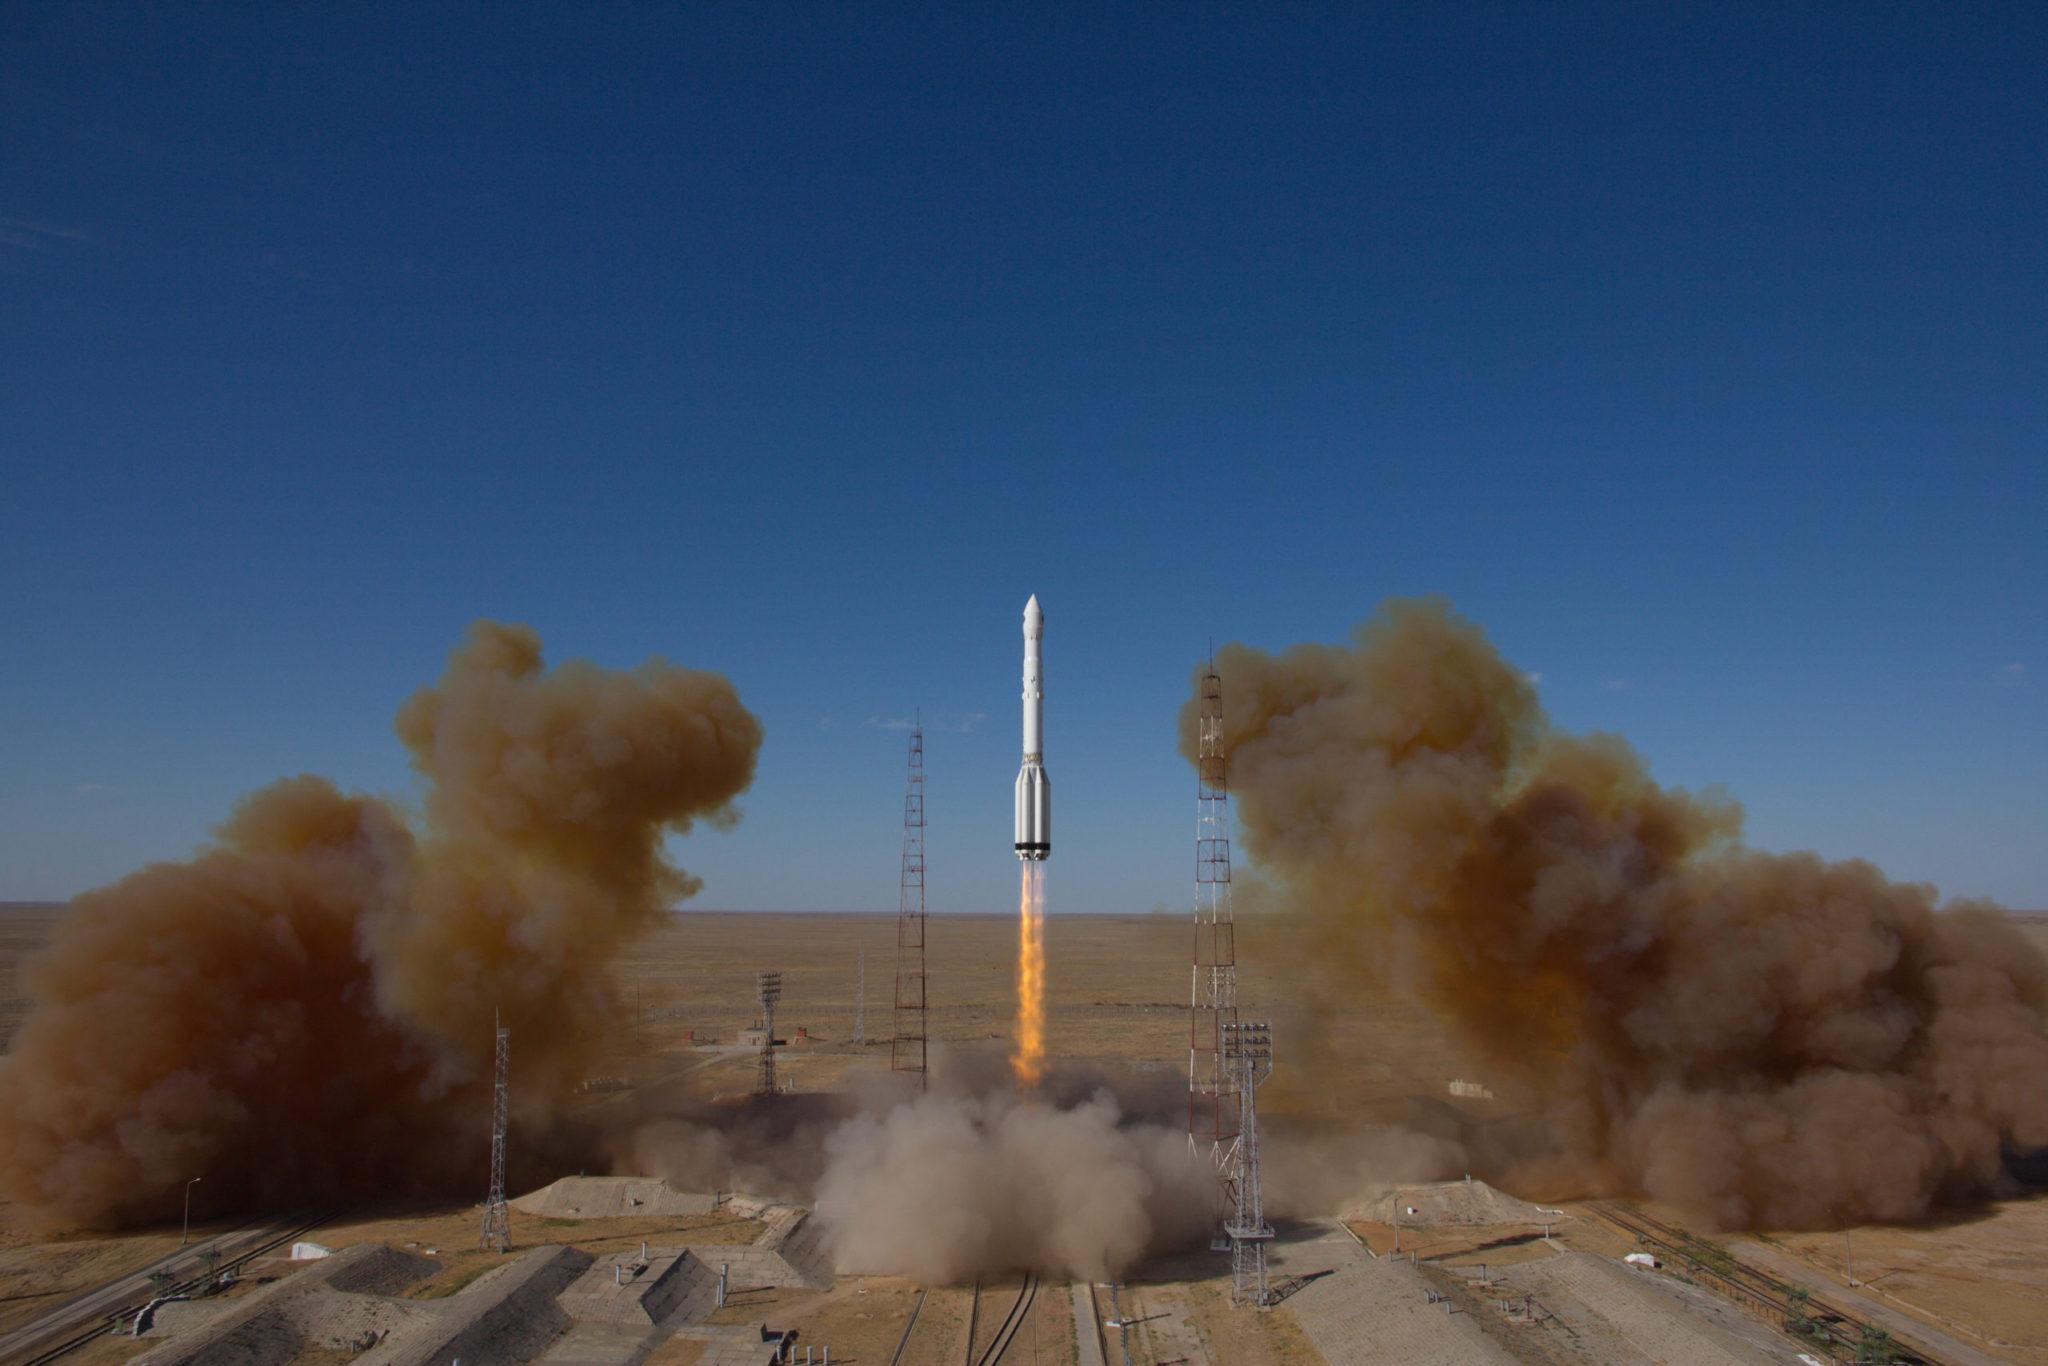 Запуск «Спектра-РГ». Фото КЦ «Южный» / ЦЭНКИ